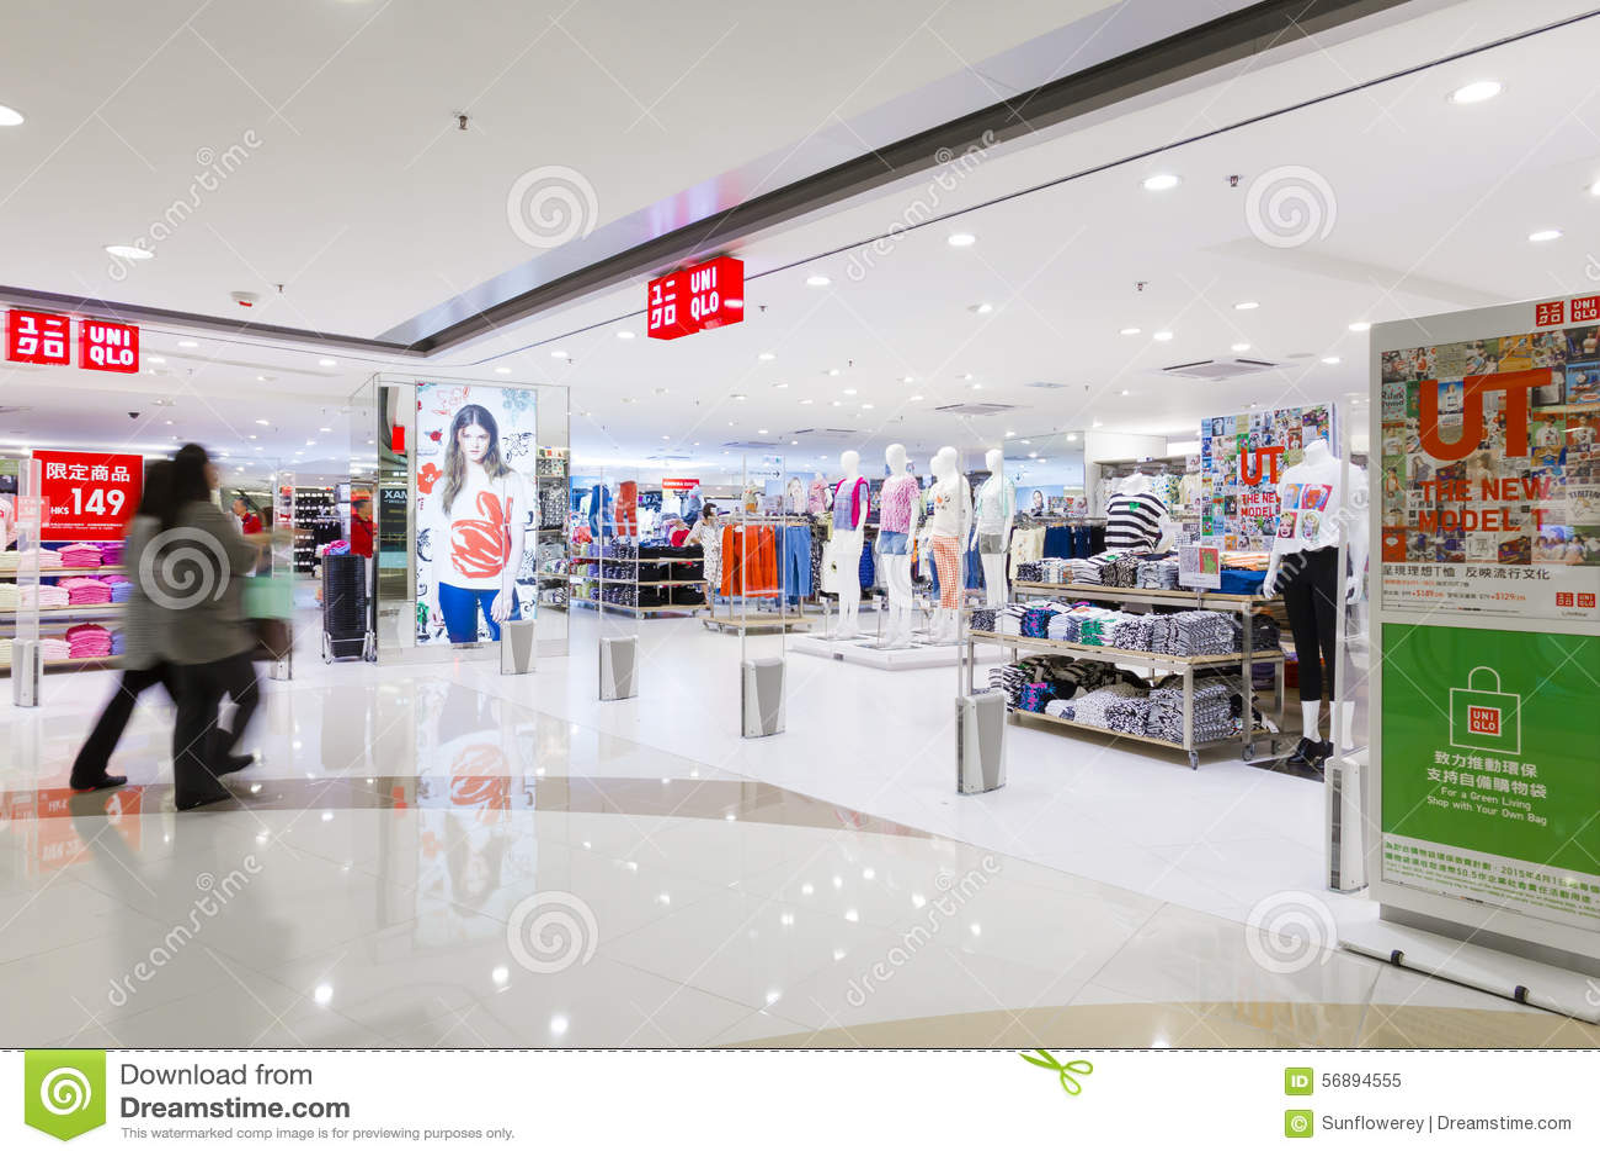 Uniqlo Fashion Store, Hong Kong Editorial Stock Image - Image ...